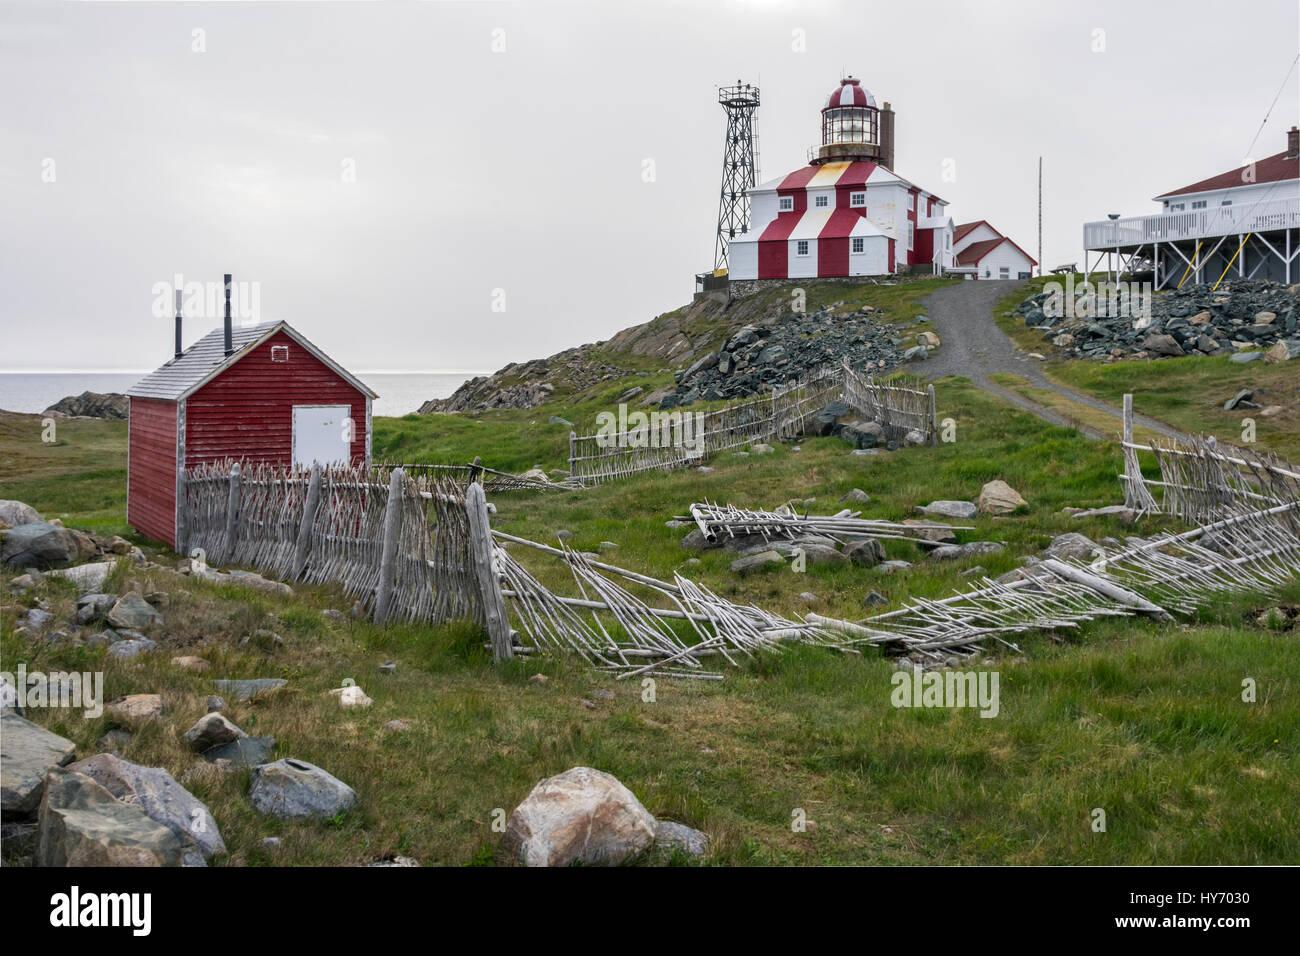 Cape Bonavista lighthouse with red shed and stick fence, Newfoundland - Stock Image